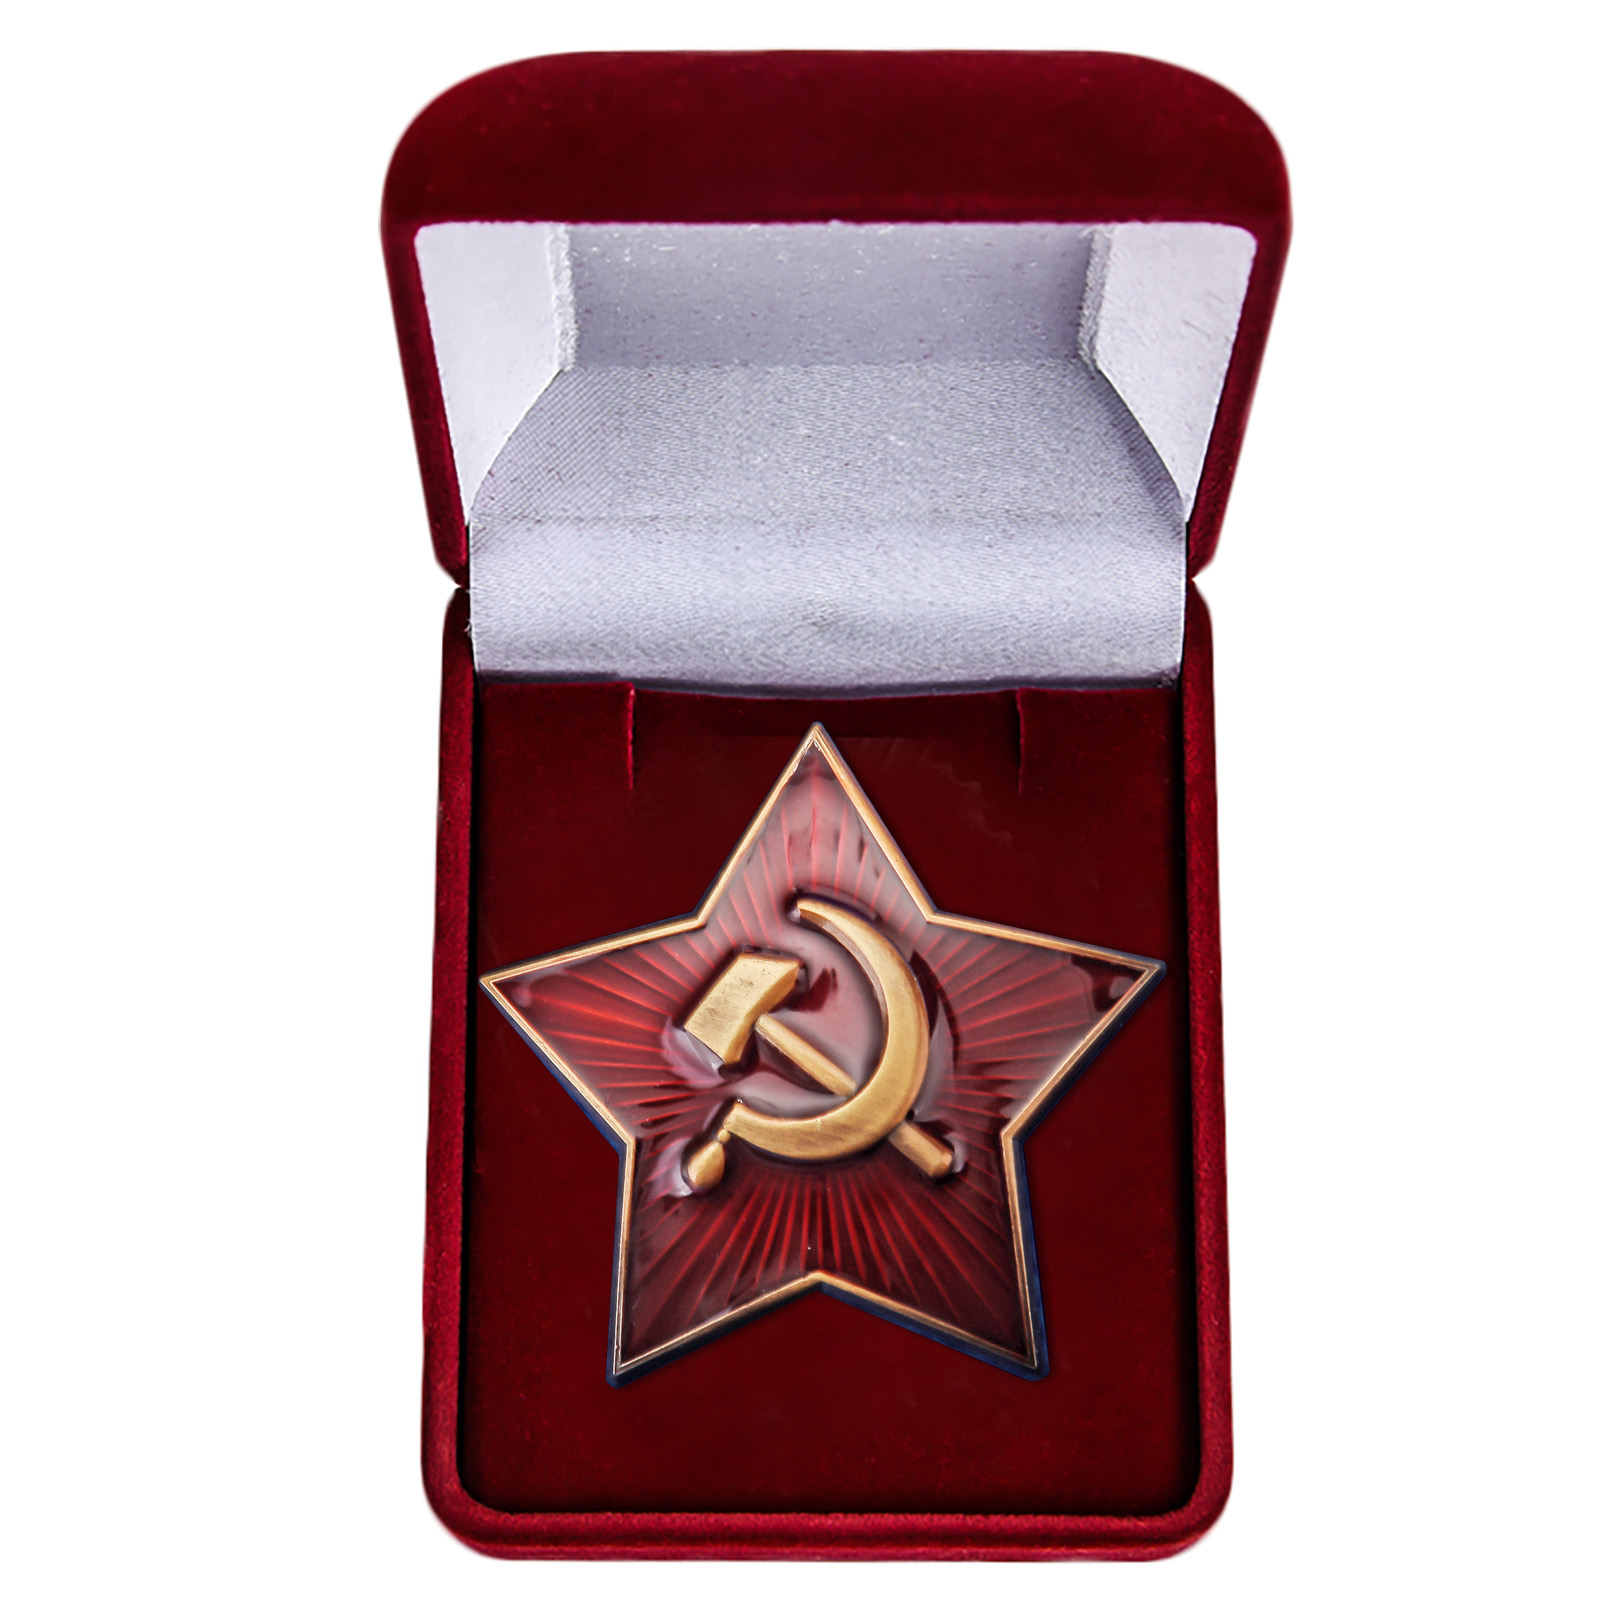 Латунная звезда кокарда РККА 1922 г.